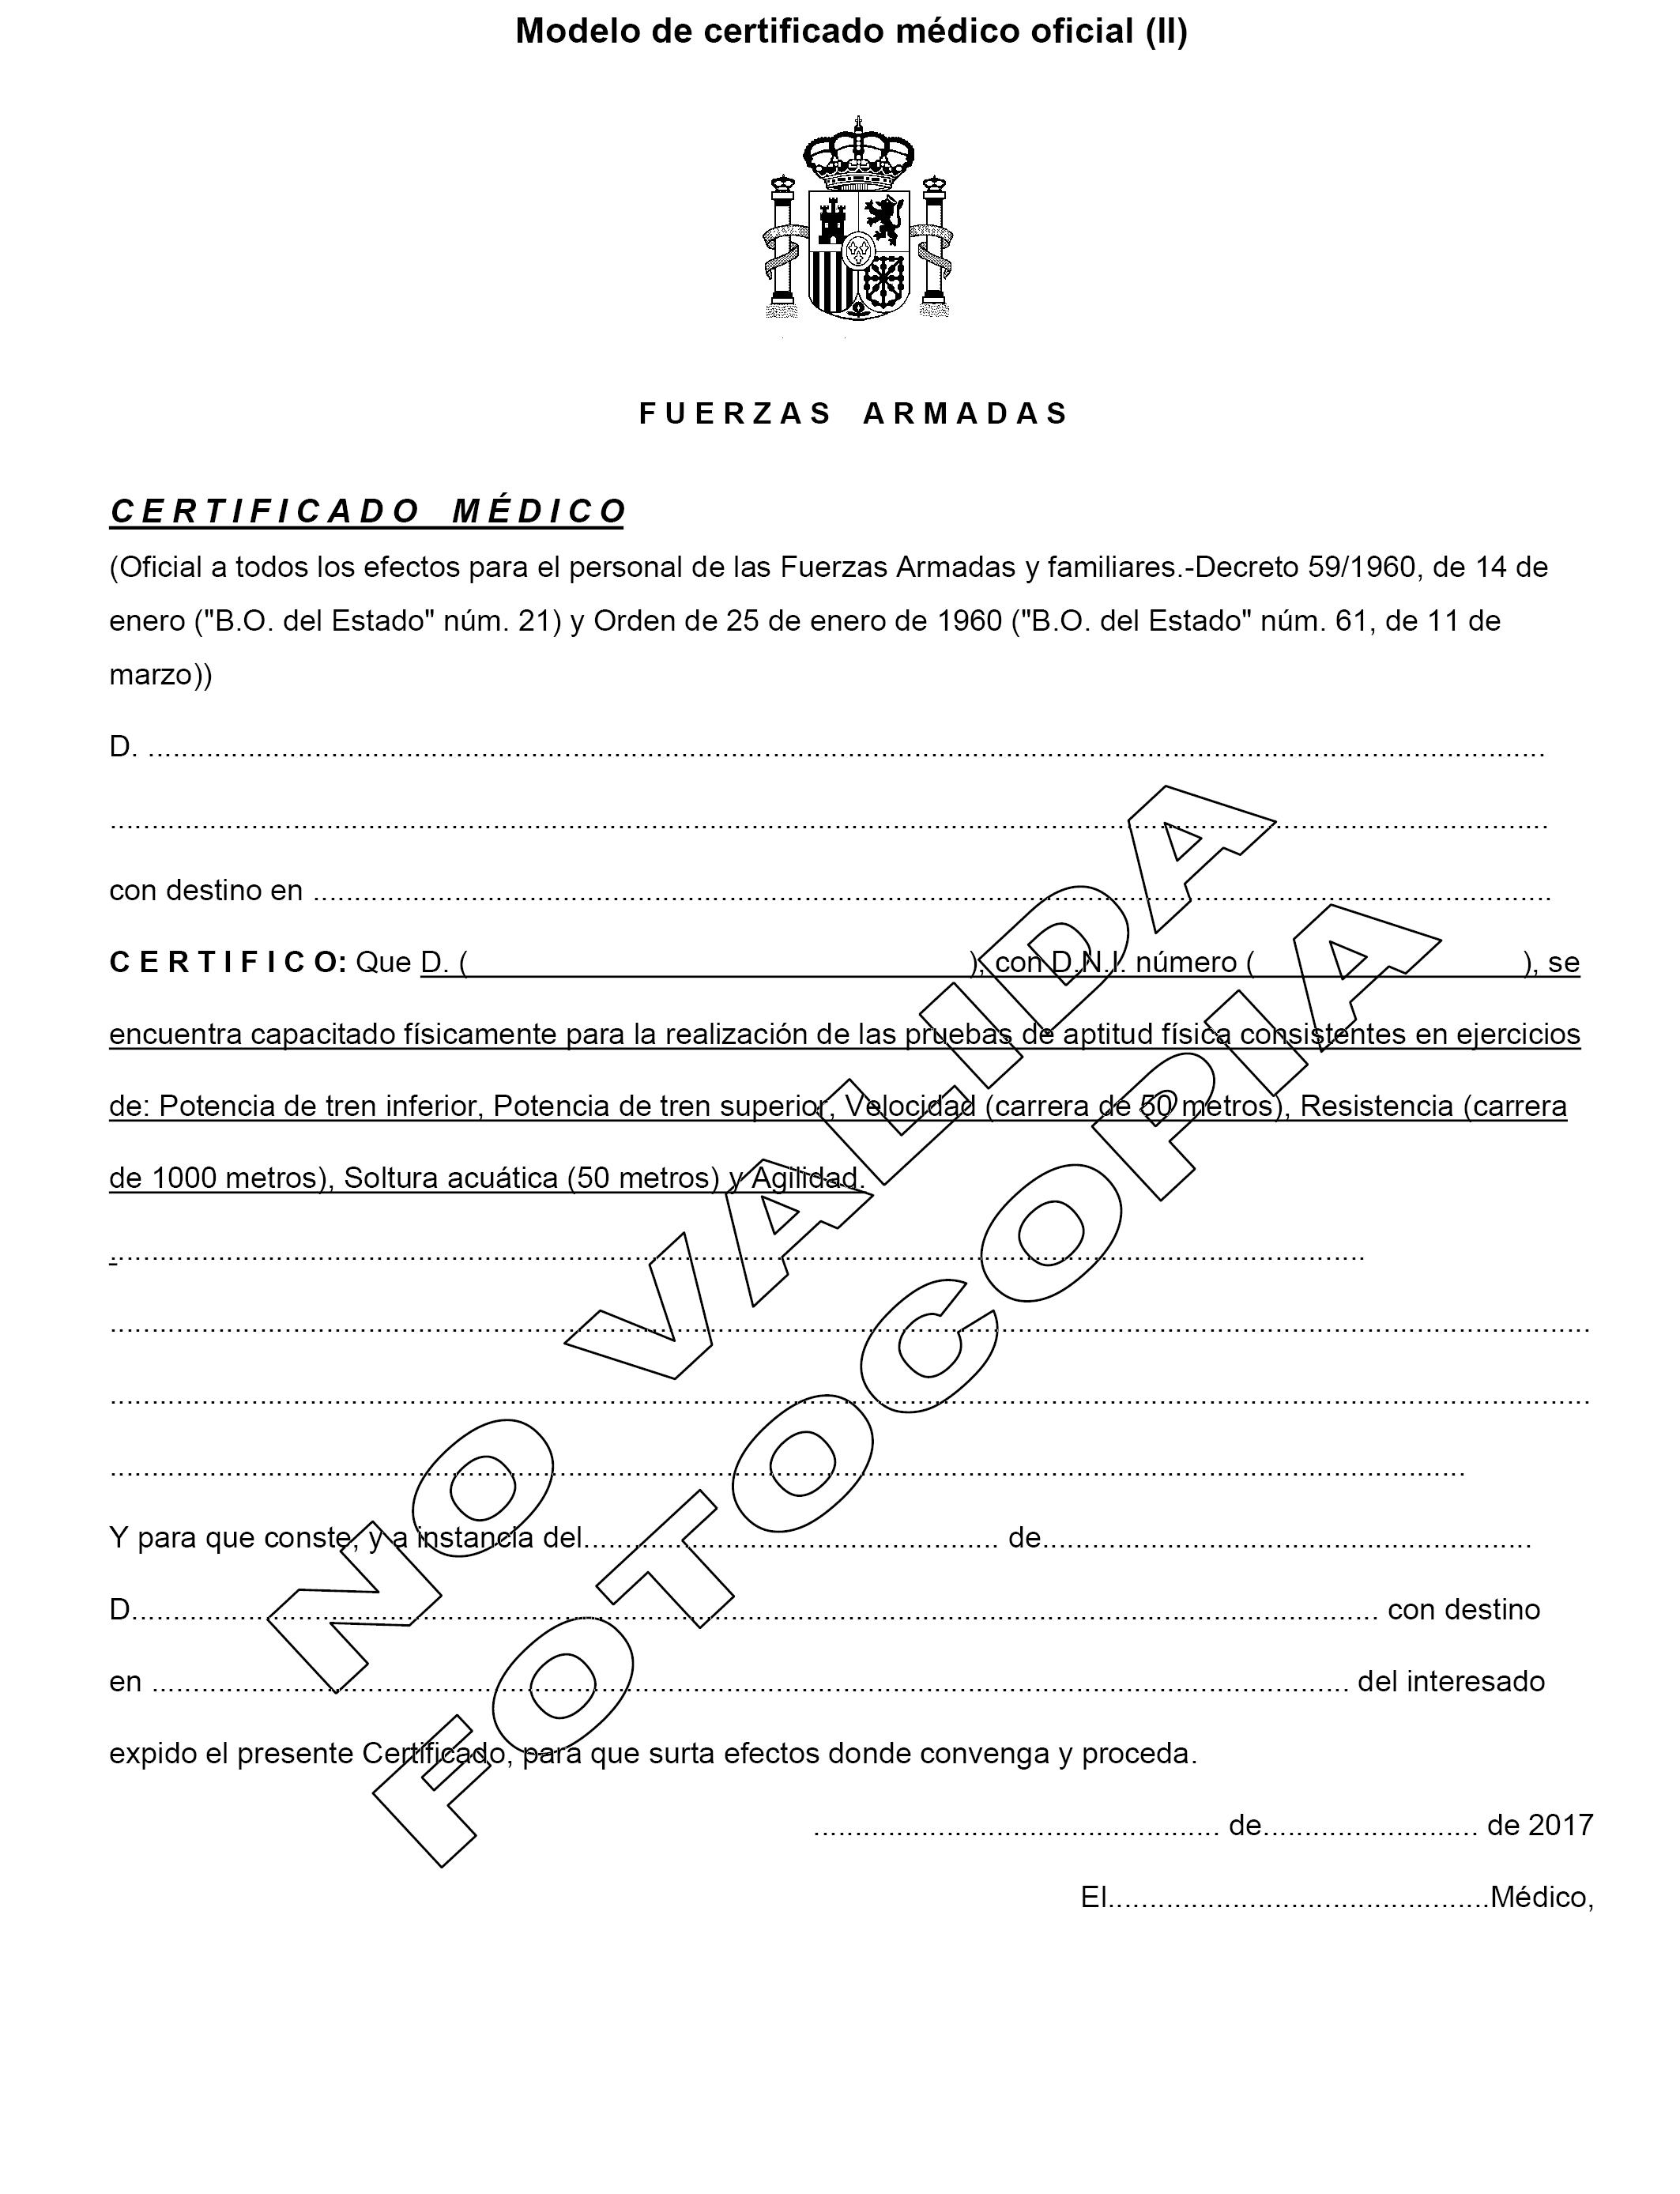 BOE.es - Documento BOE-A-2017-5916